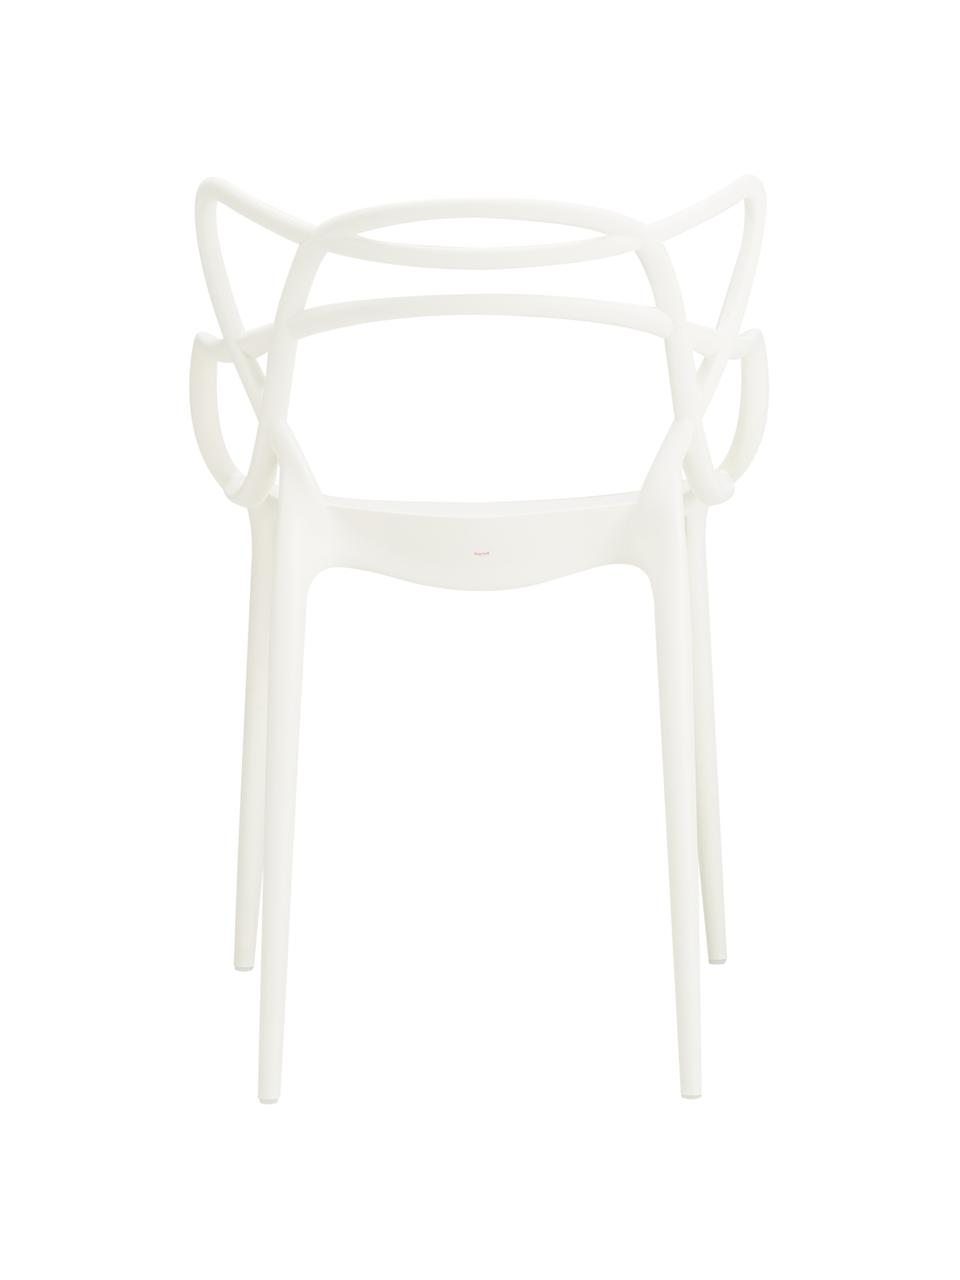 Stapelbare Armlehnstühle Masters, 2 Stück, Polypropylen, Weiß, 57 x 84 cm